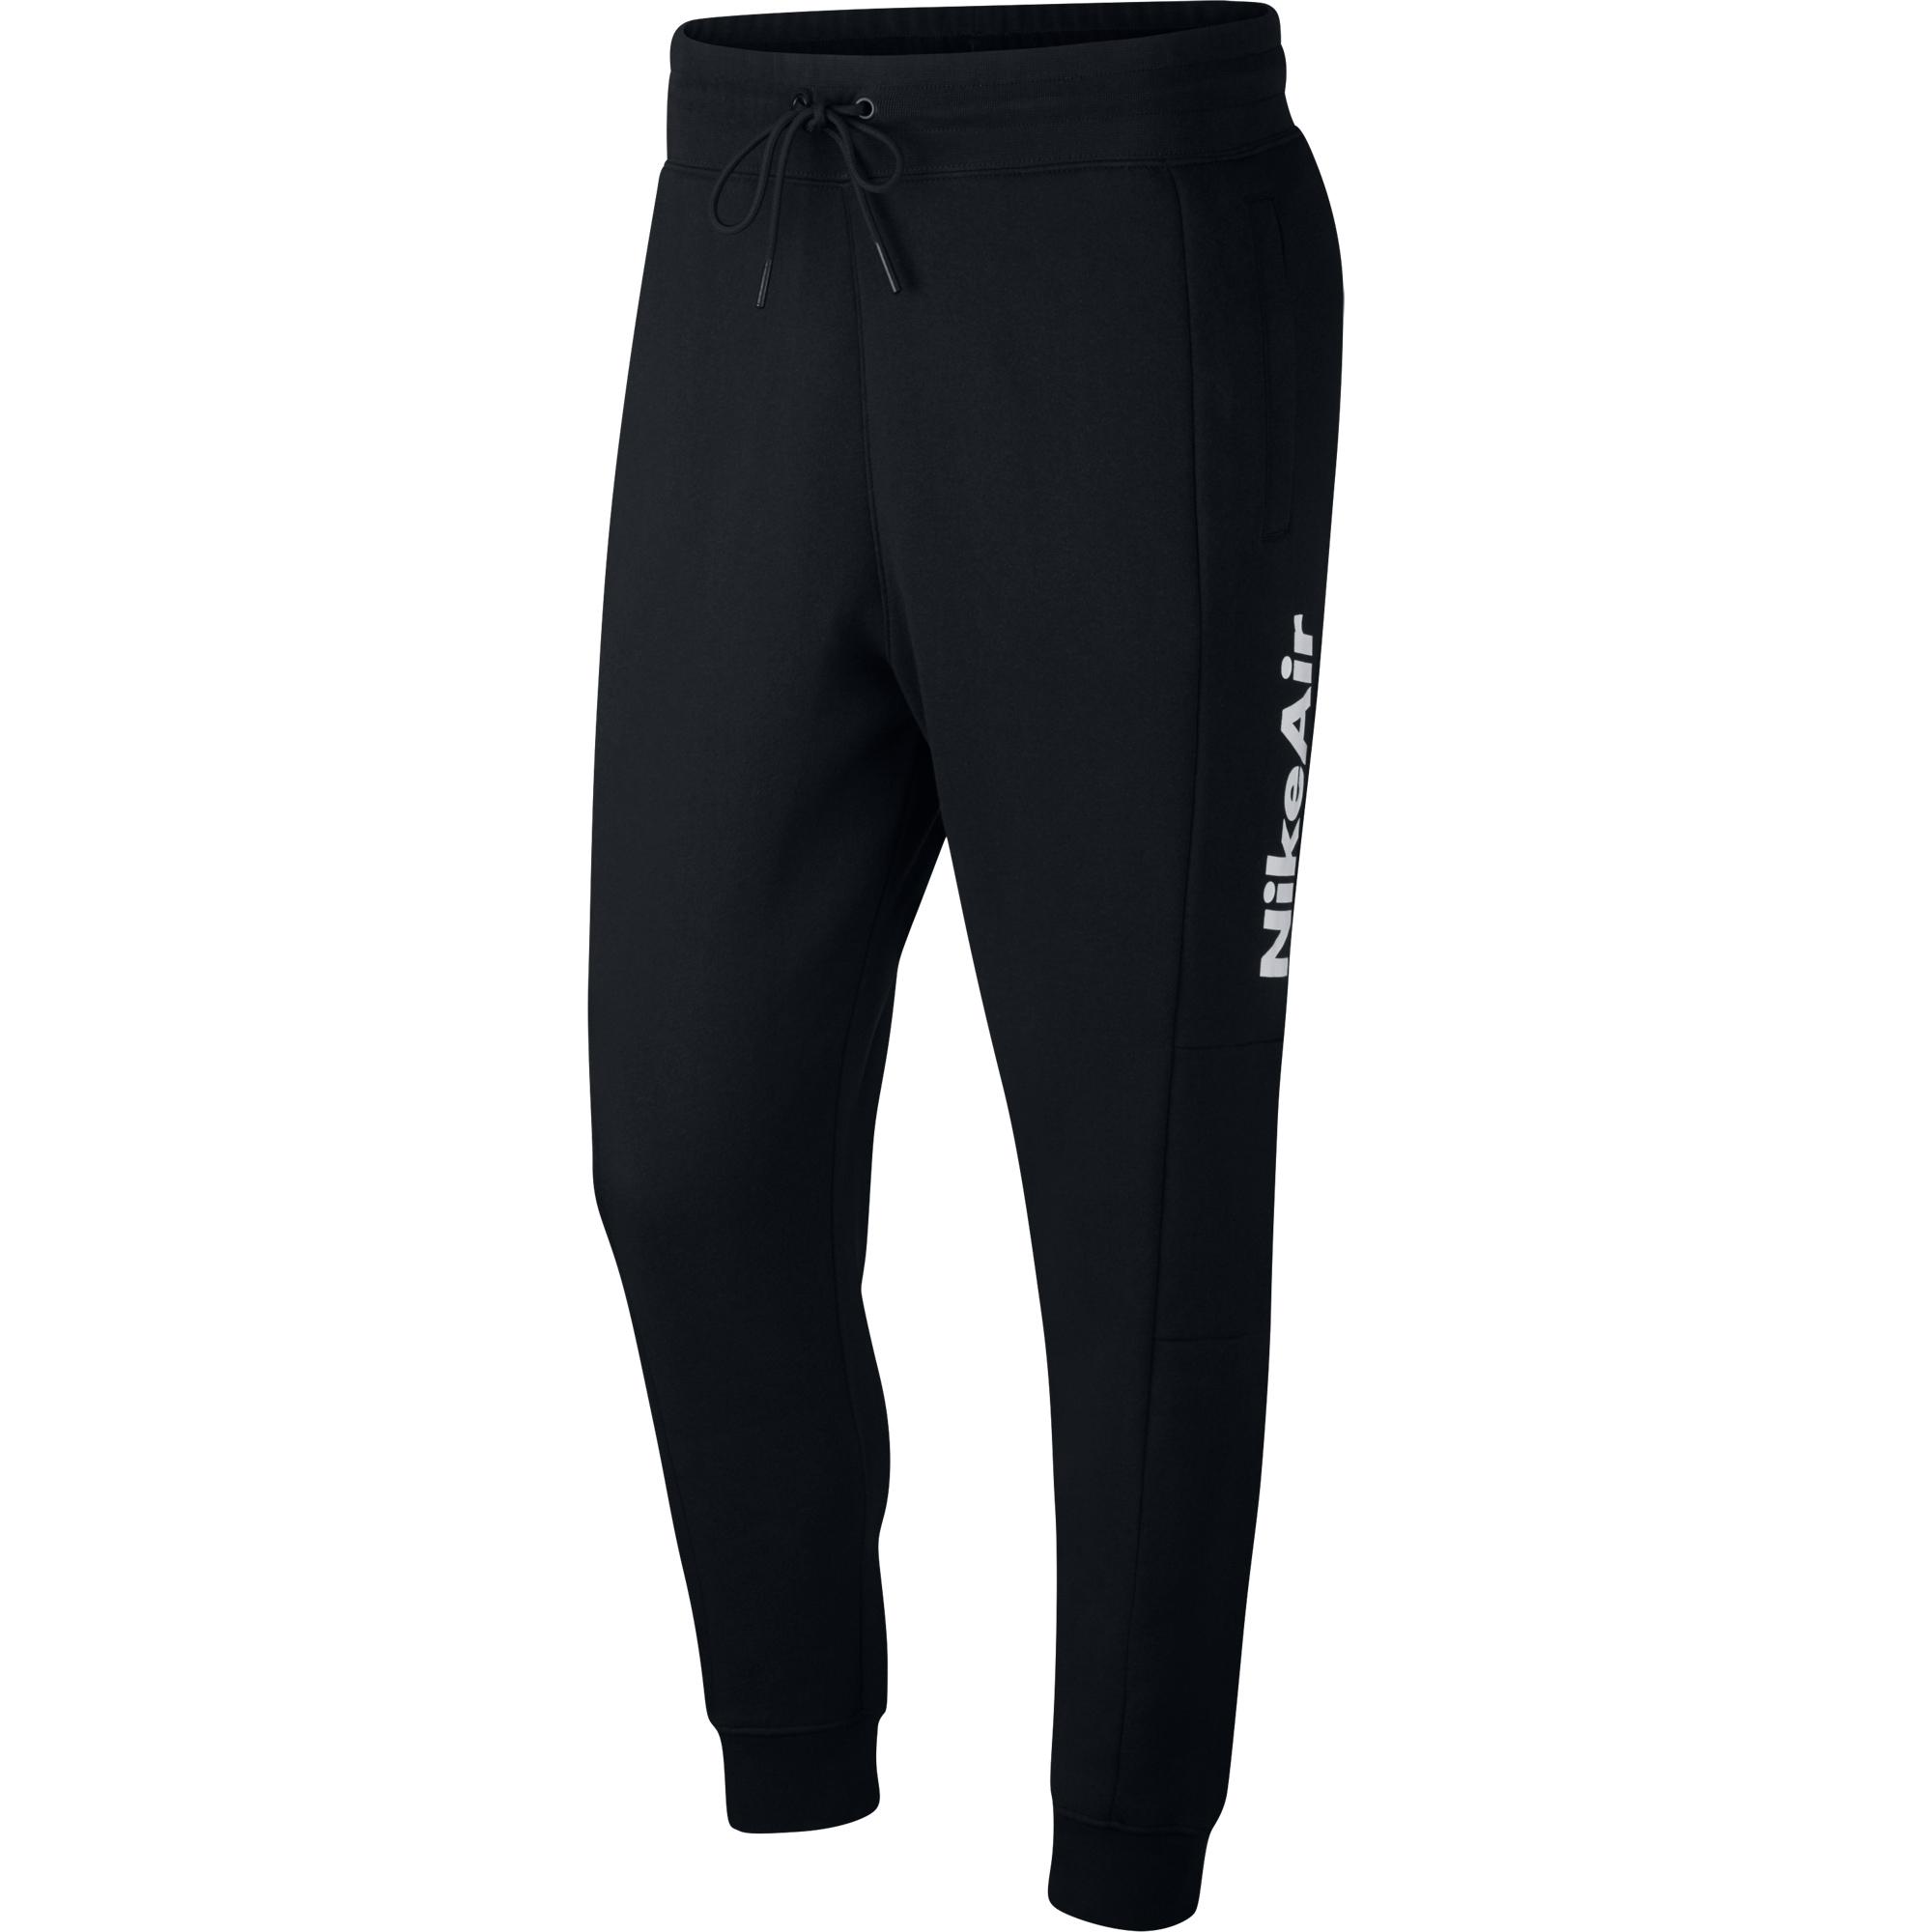 Nike Sportwear Air Erkek Siyah Eşofman Altı